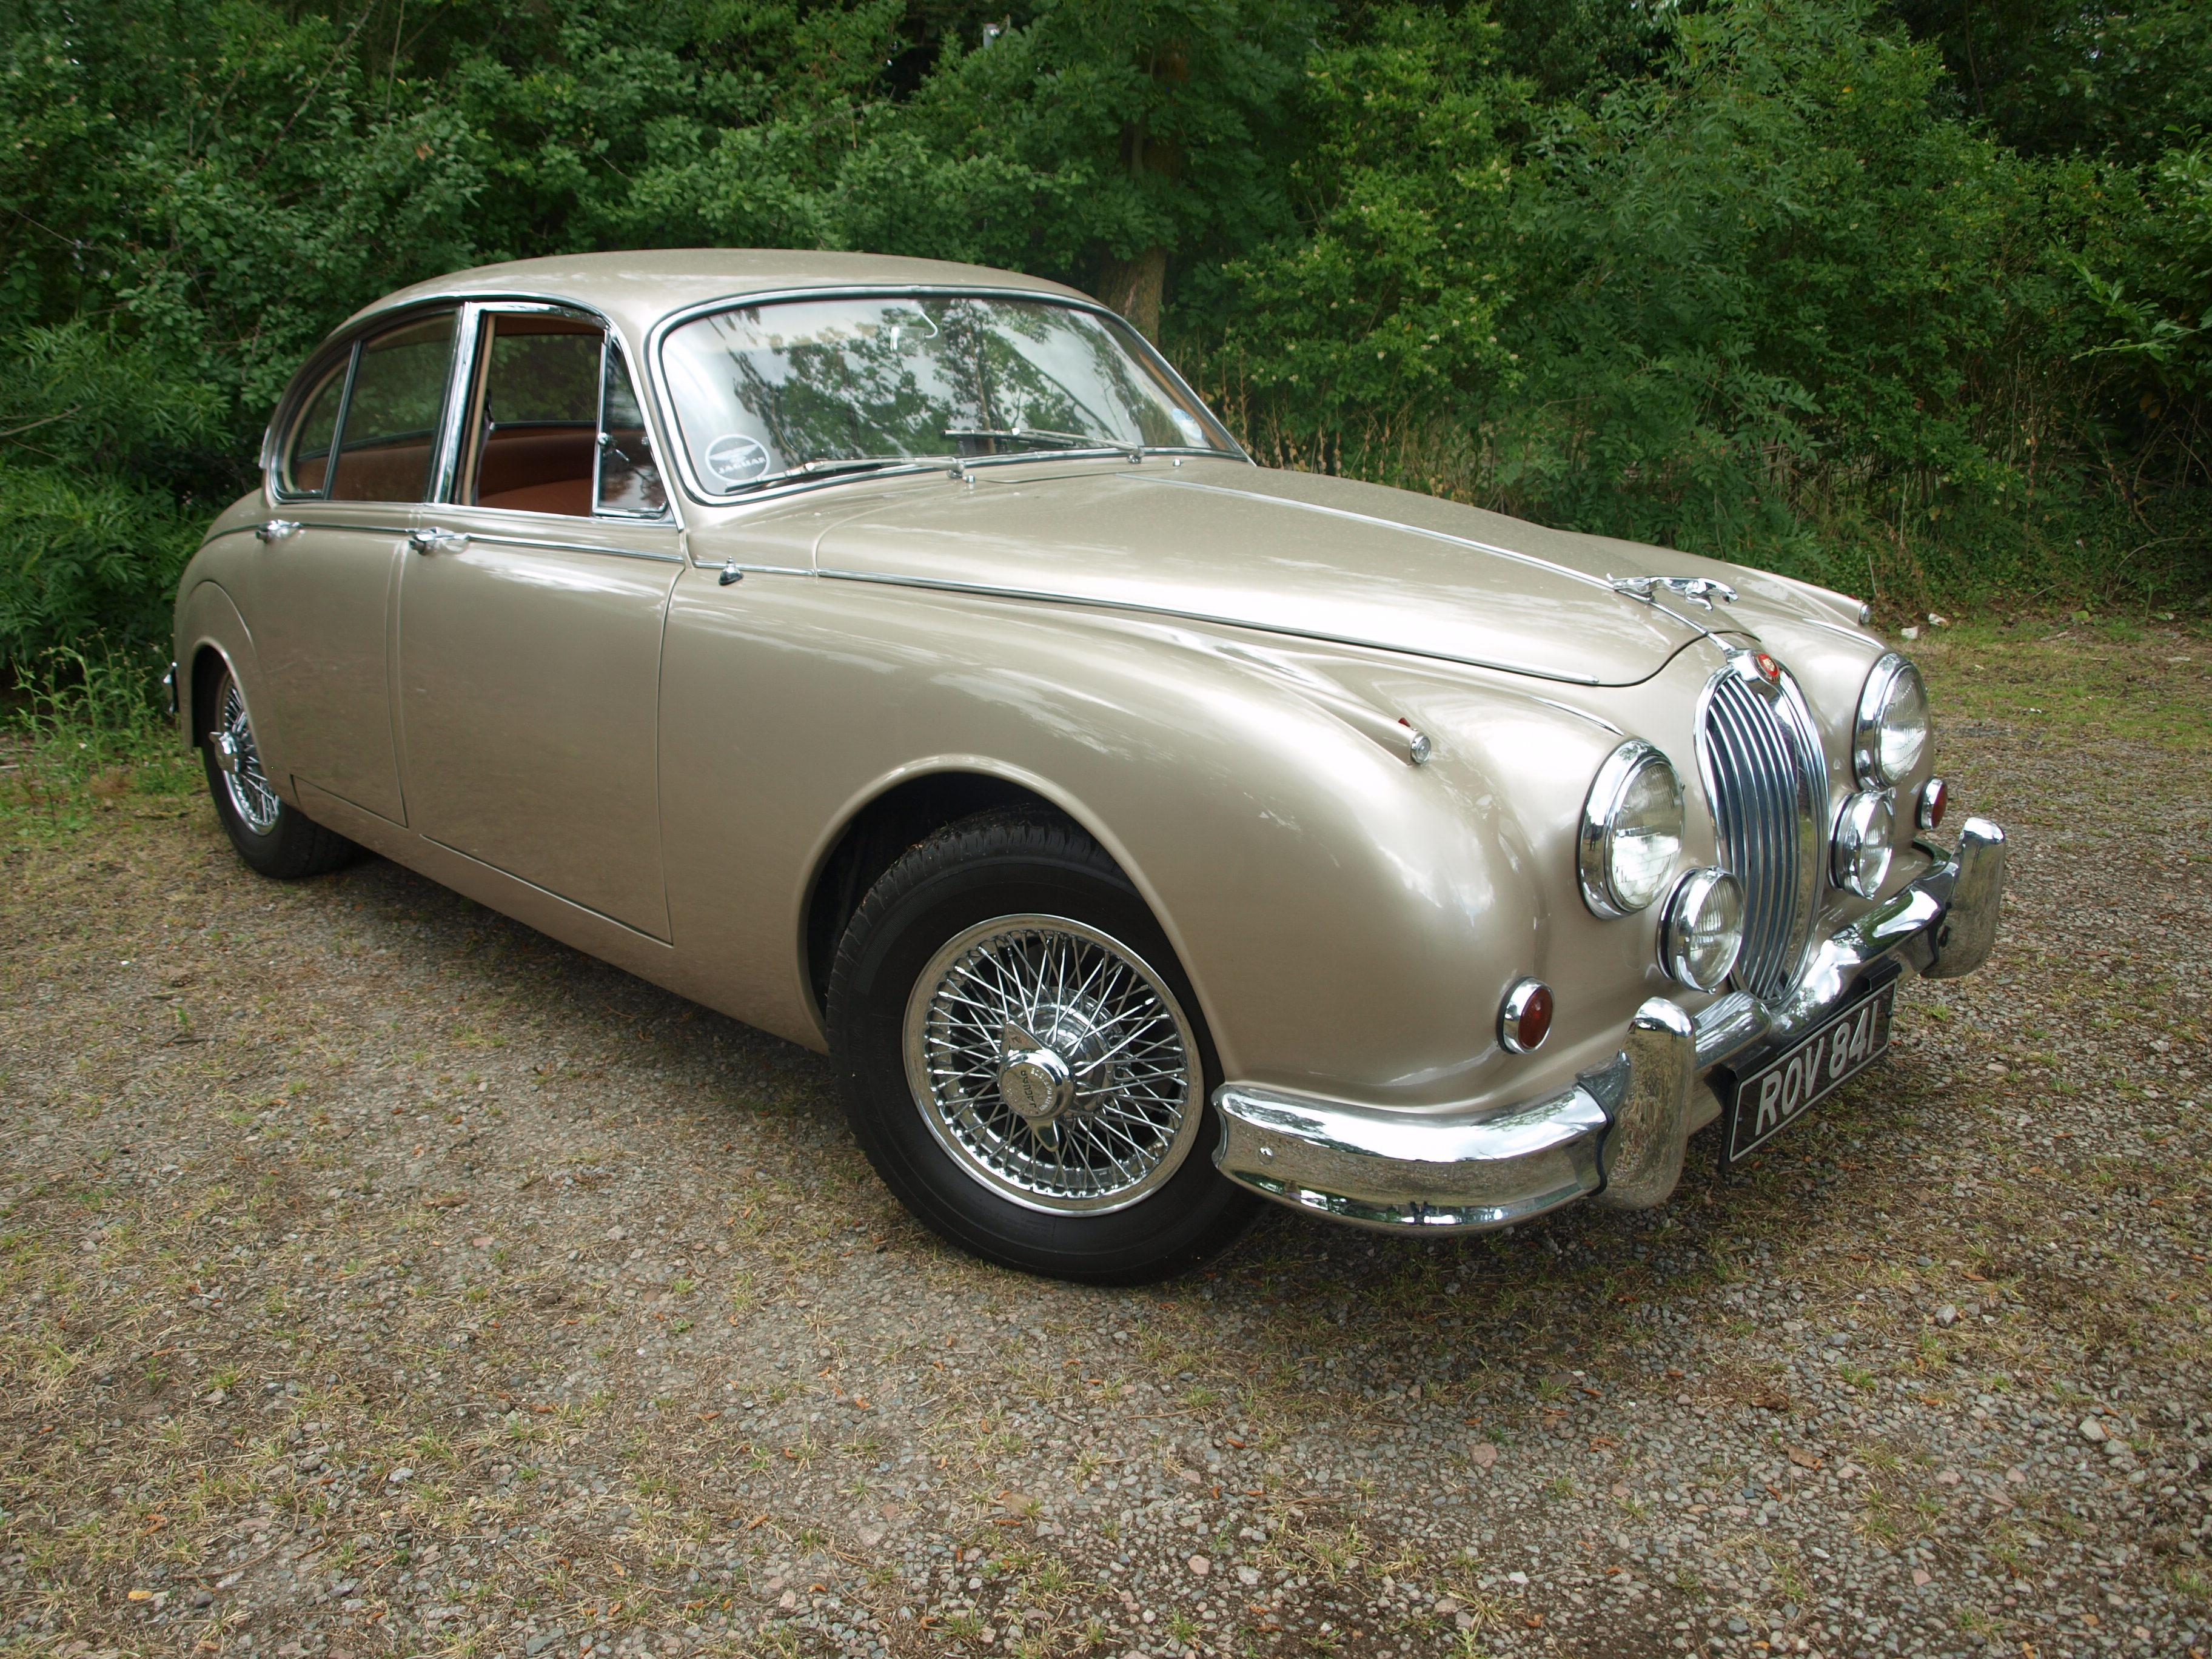 1963 Jaguar MK II 2.4 Litre - Classic Car Auctions